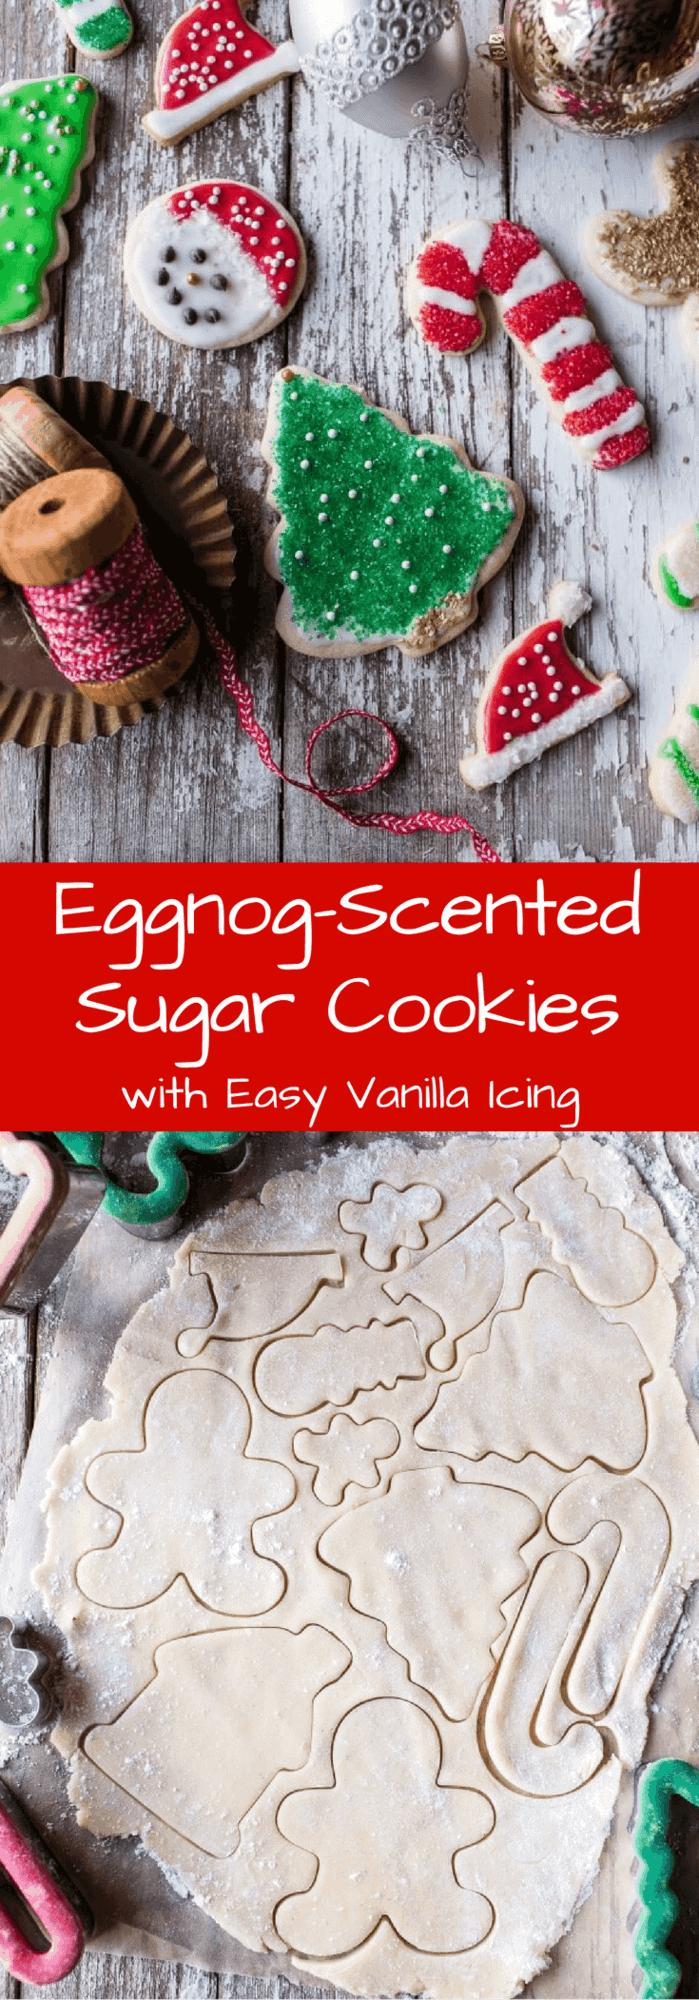 Eggnog-Scented Sugar Cookies | halfbakedharvest.com @hbharvest